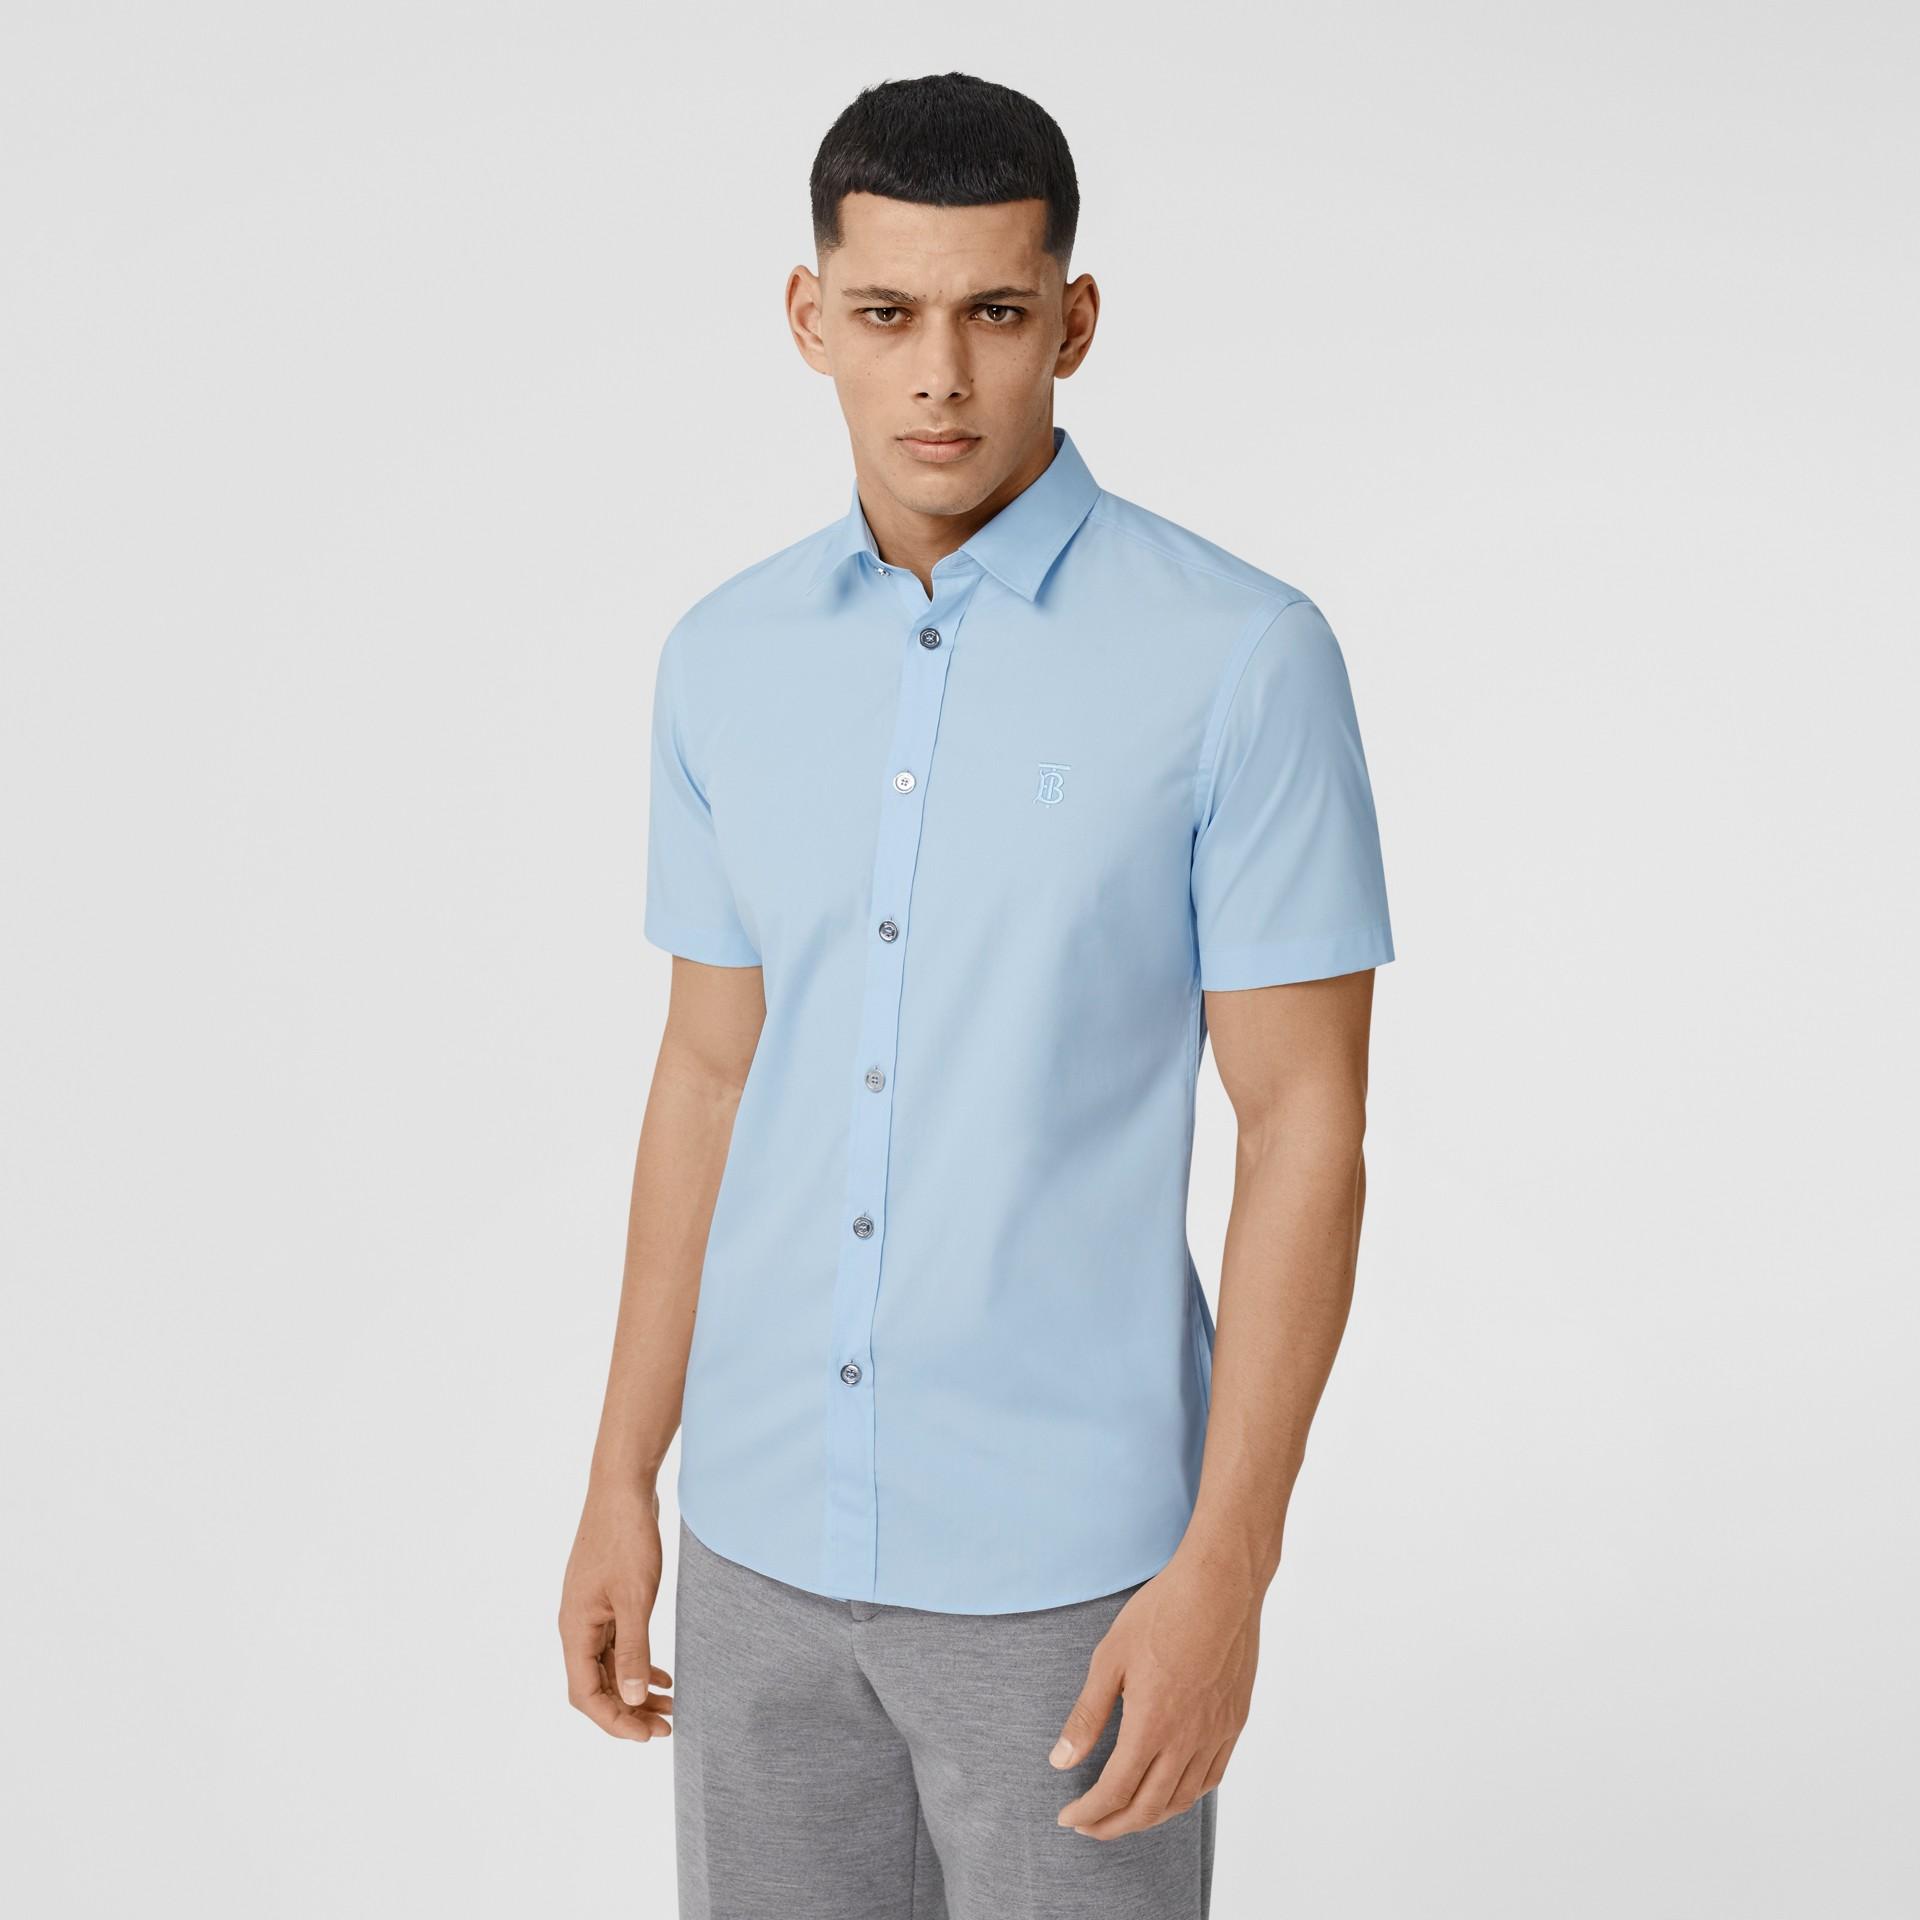 Short-sleeve Monogram Motif Stretch Cotton Shirt in Pale Blue - Men | Burberry United Kingdom - gallery image 0